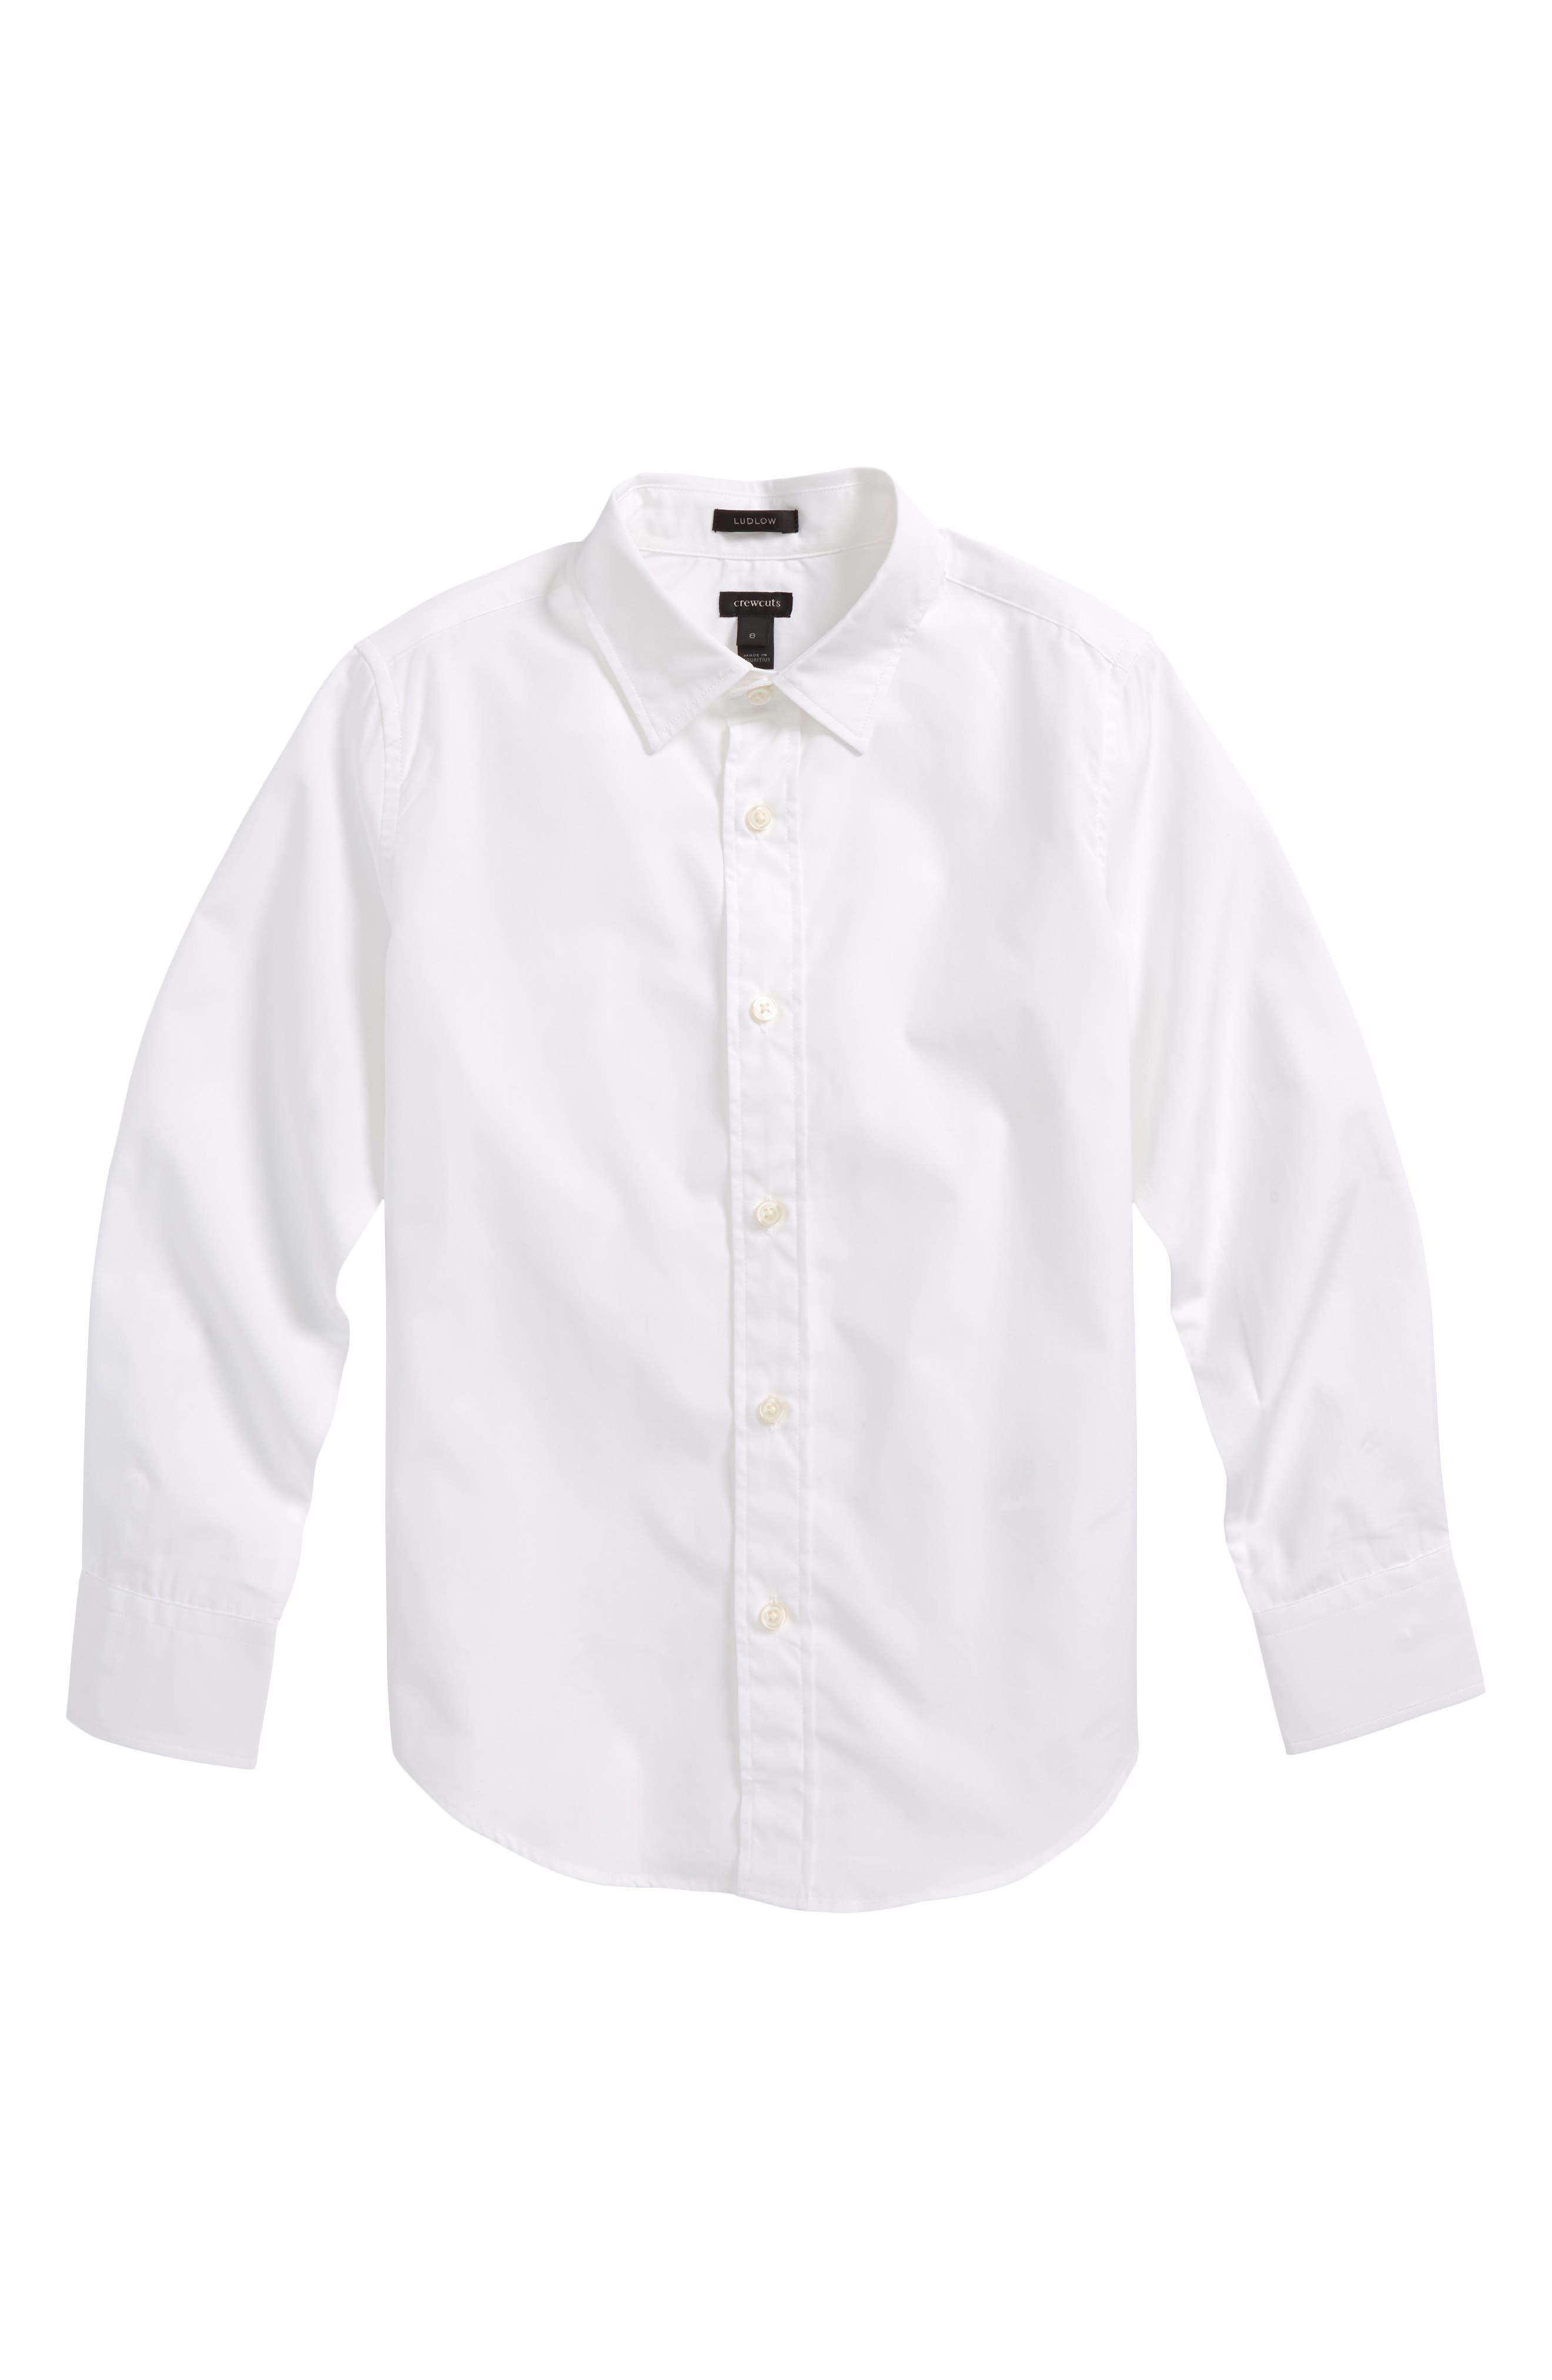 Ludlow Dress Shirt,                             Main thumbnail 1, color,                             100